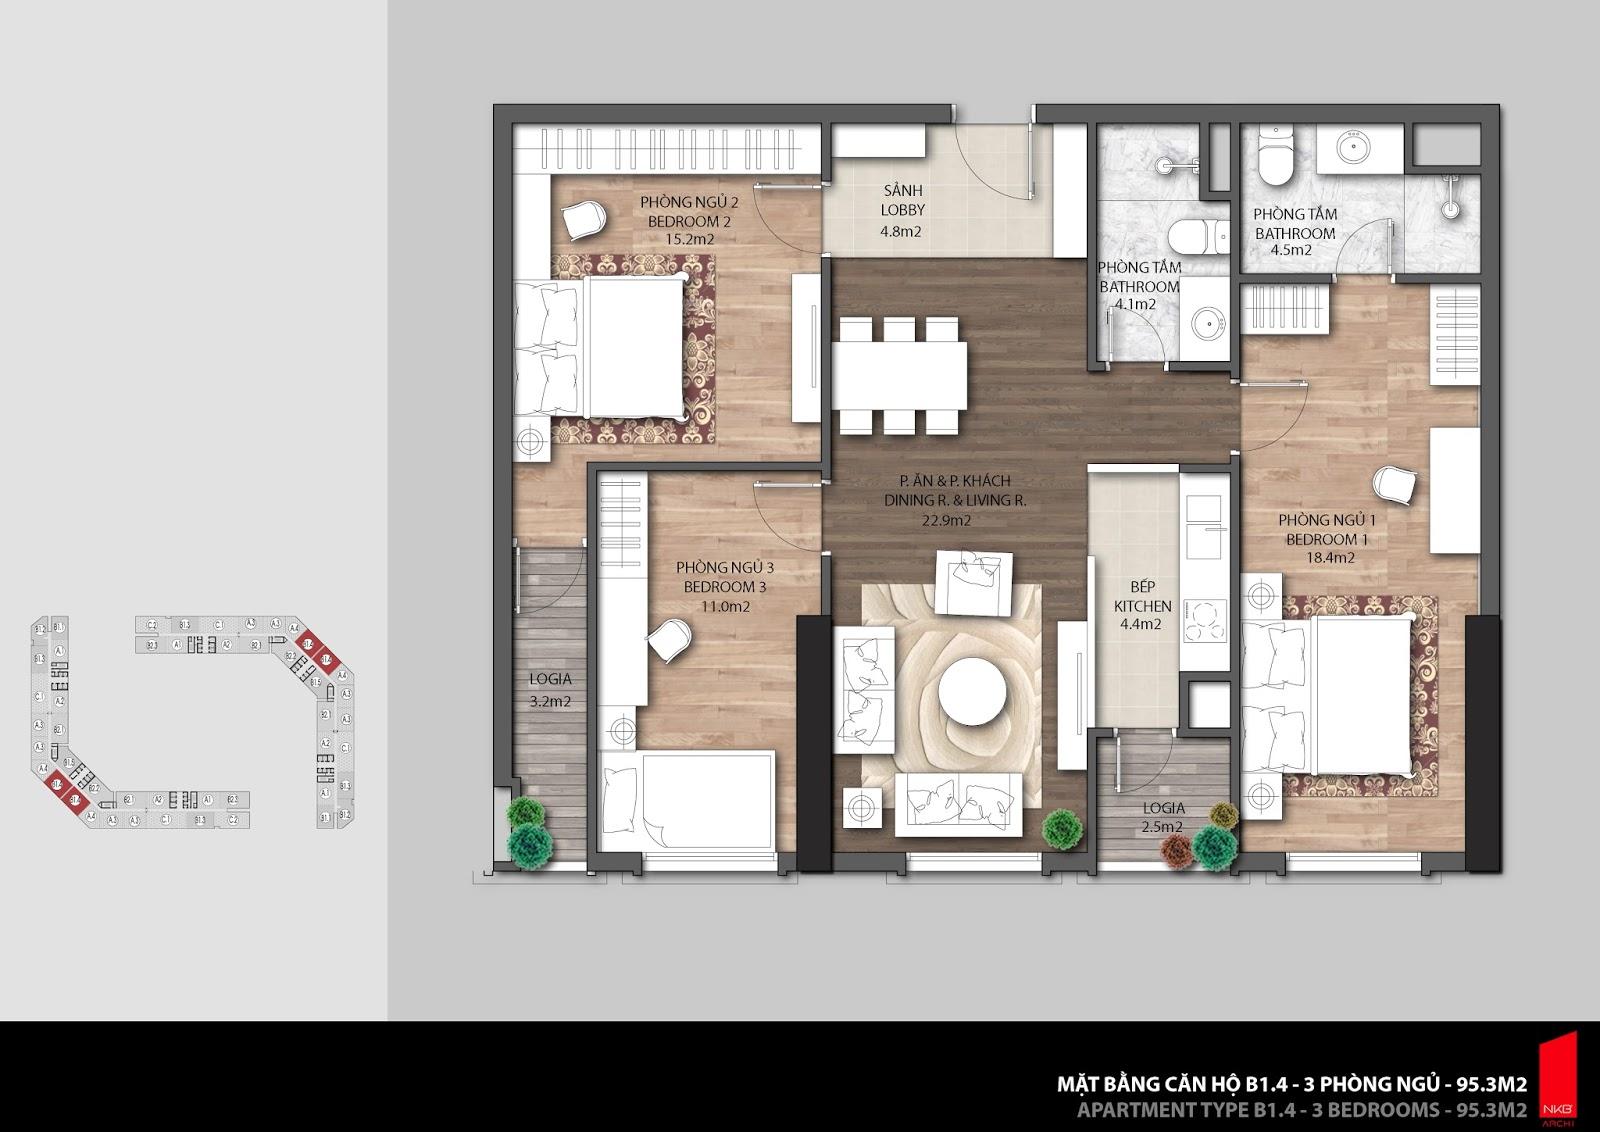 Mặt bằng căn hộ 95,3m2